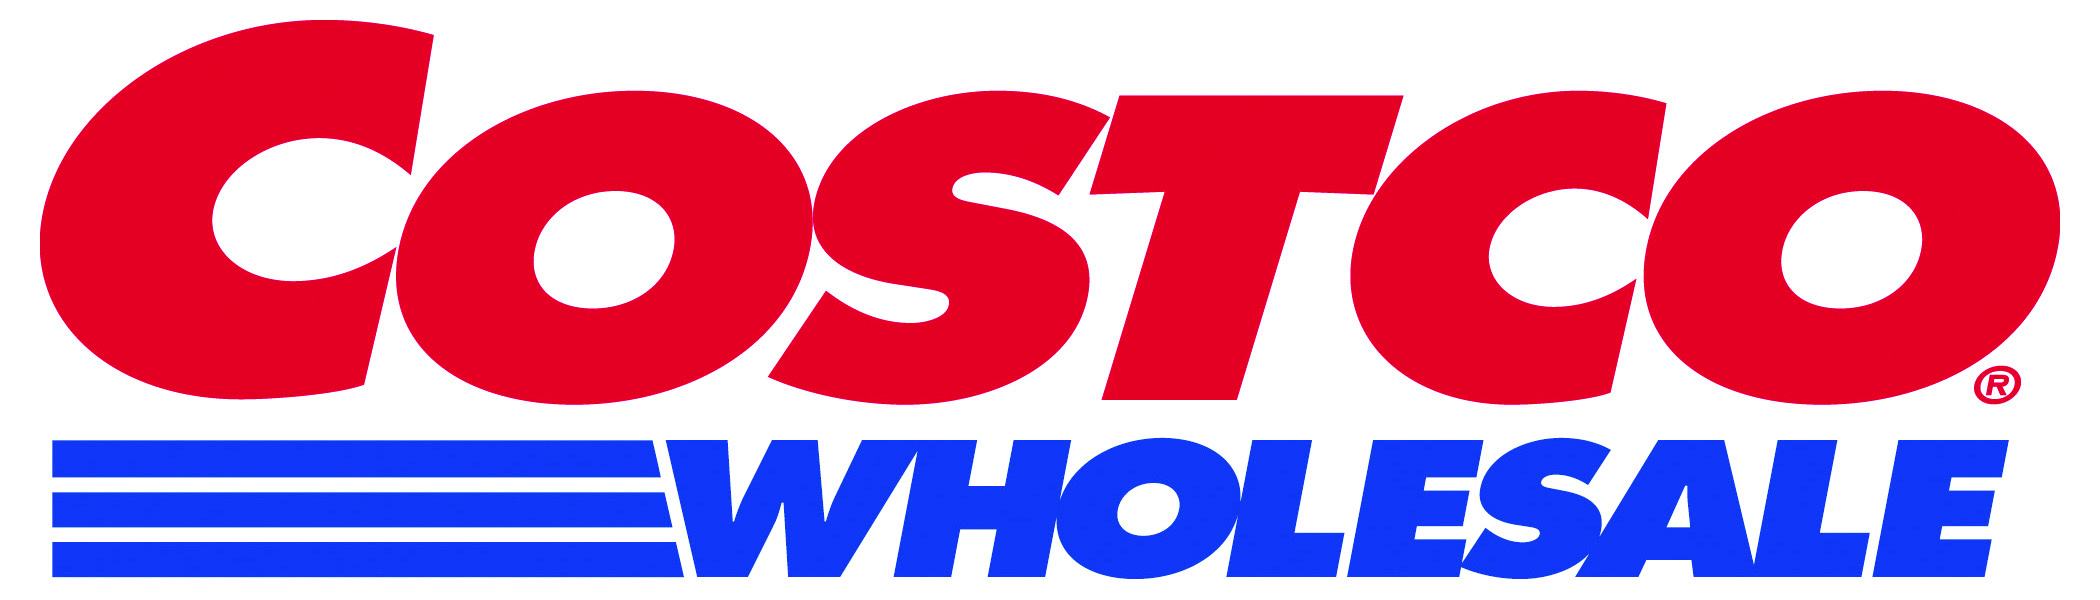 Costco Wholesale logo